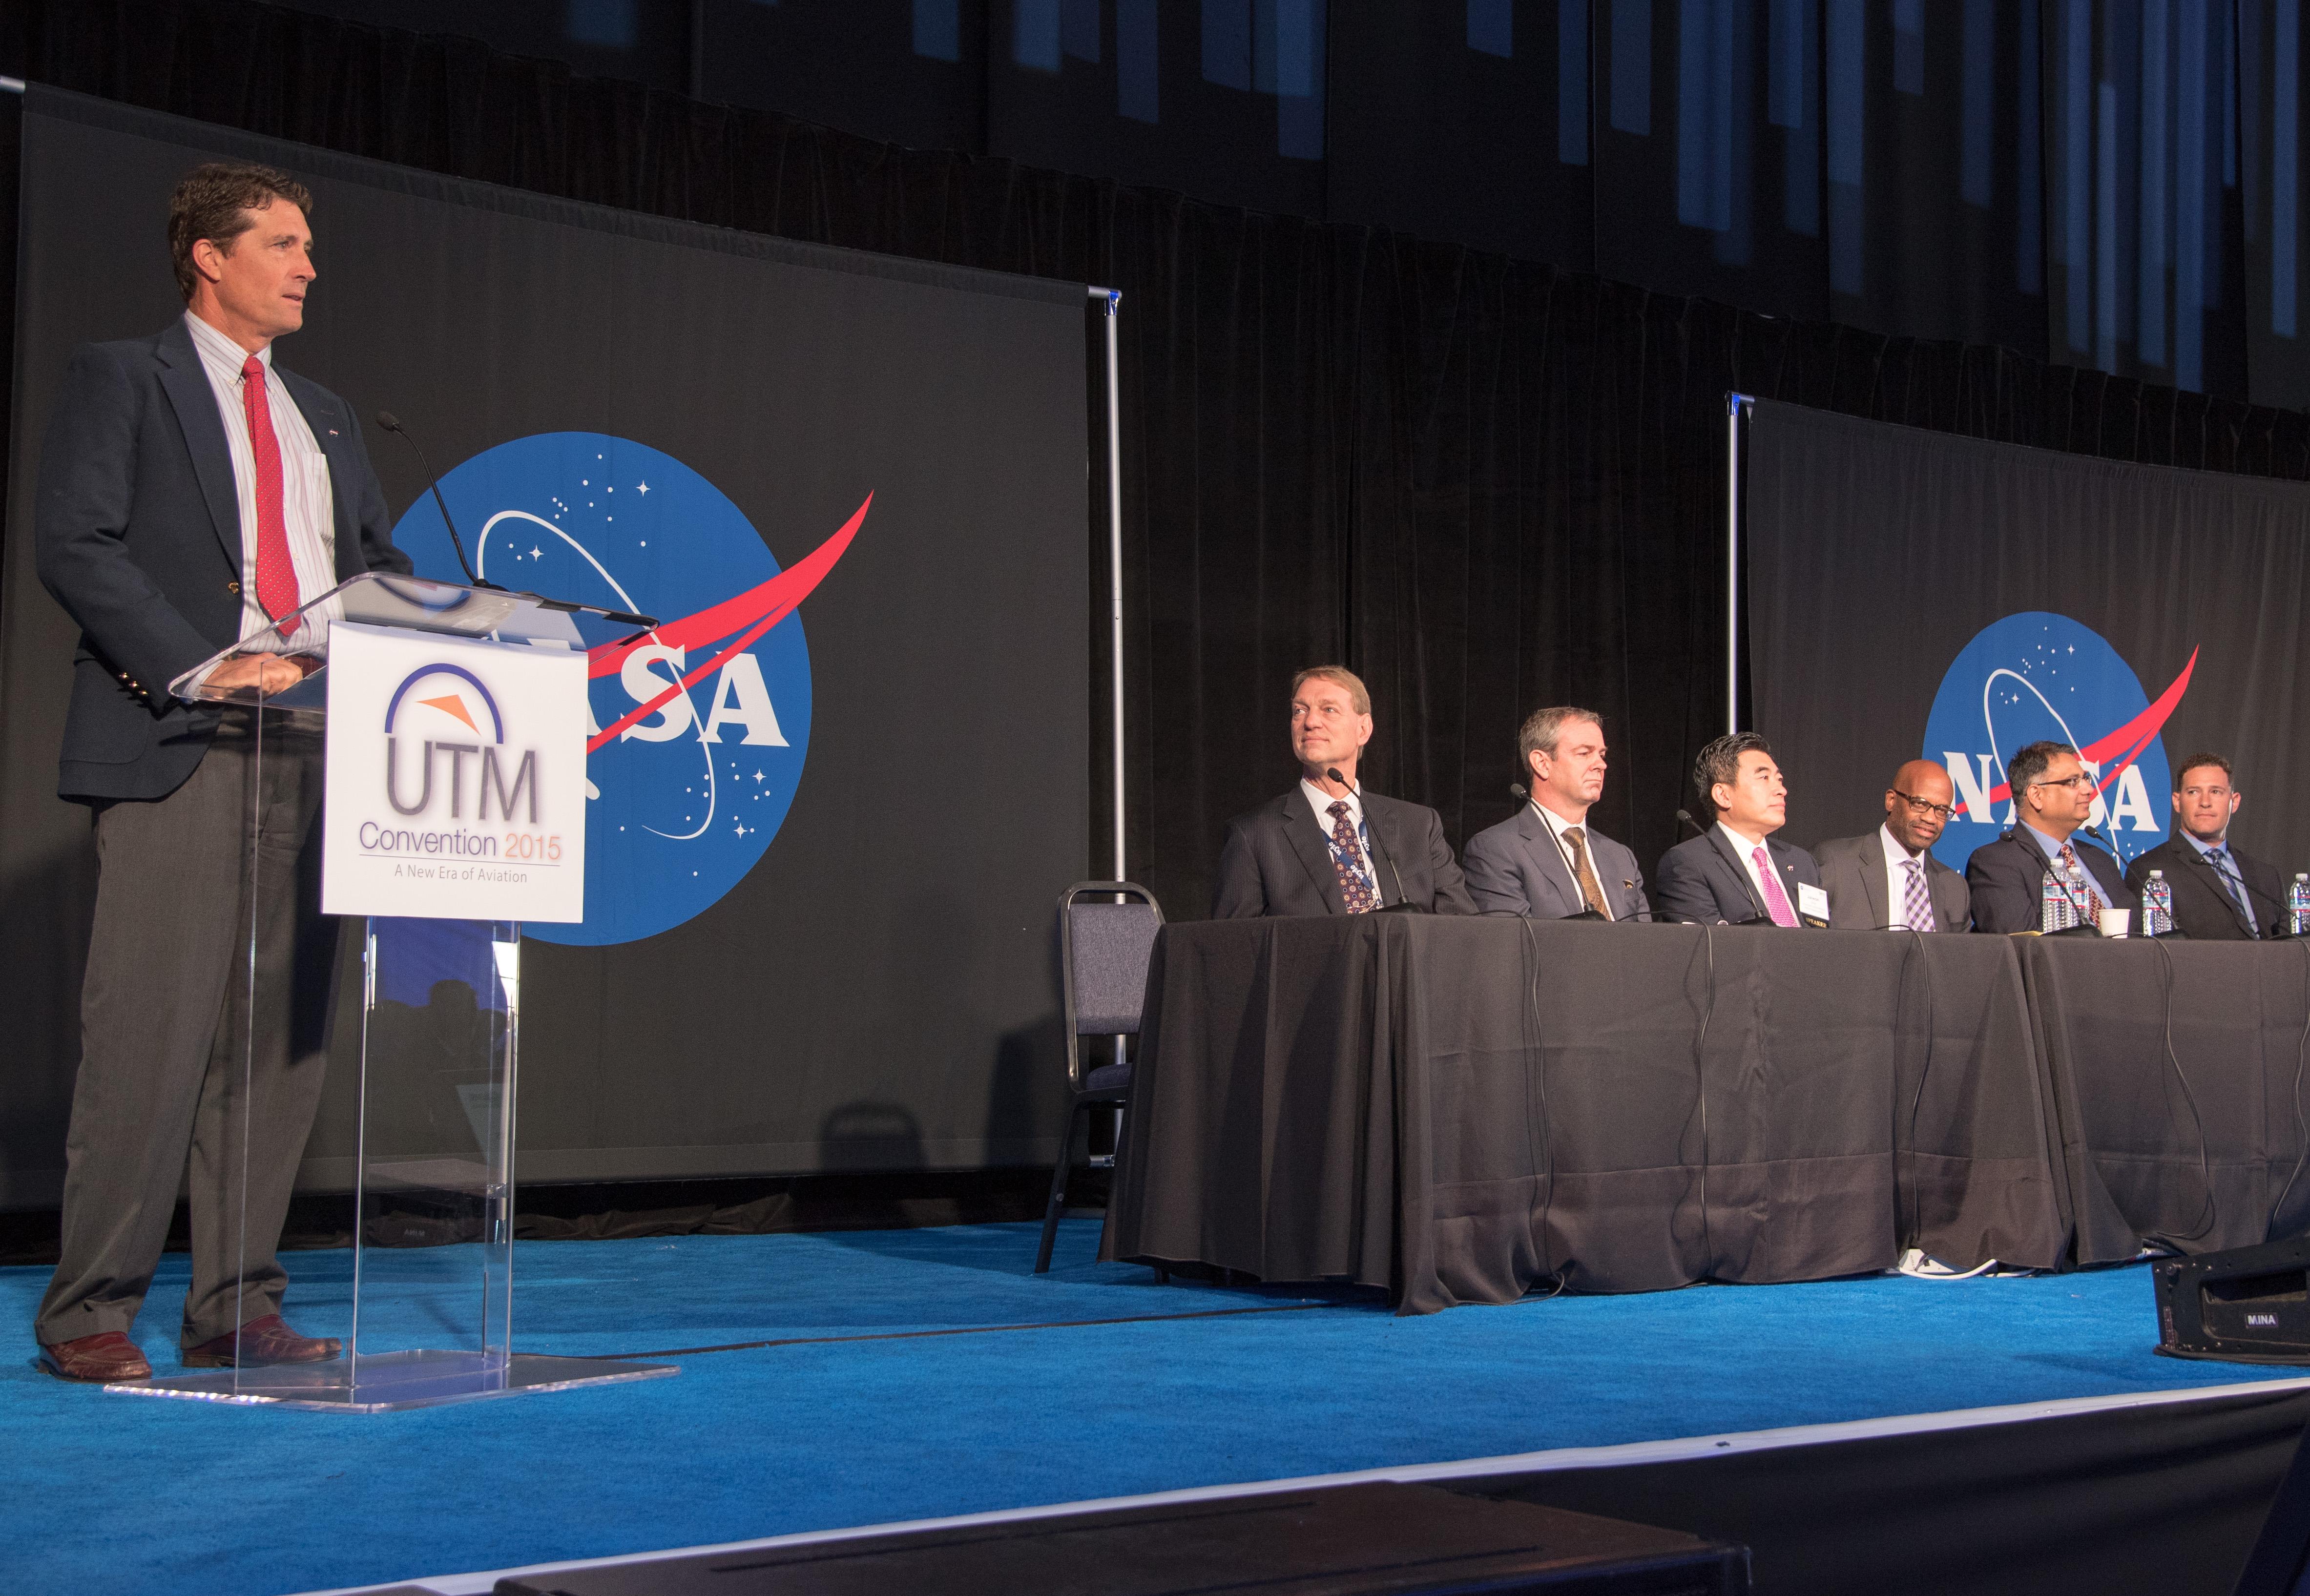 NASA - UTM project